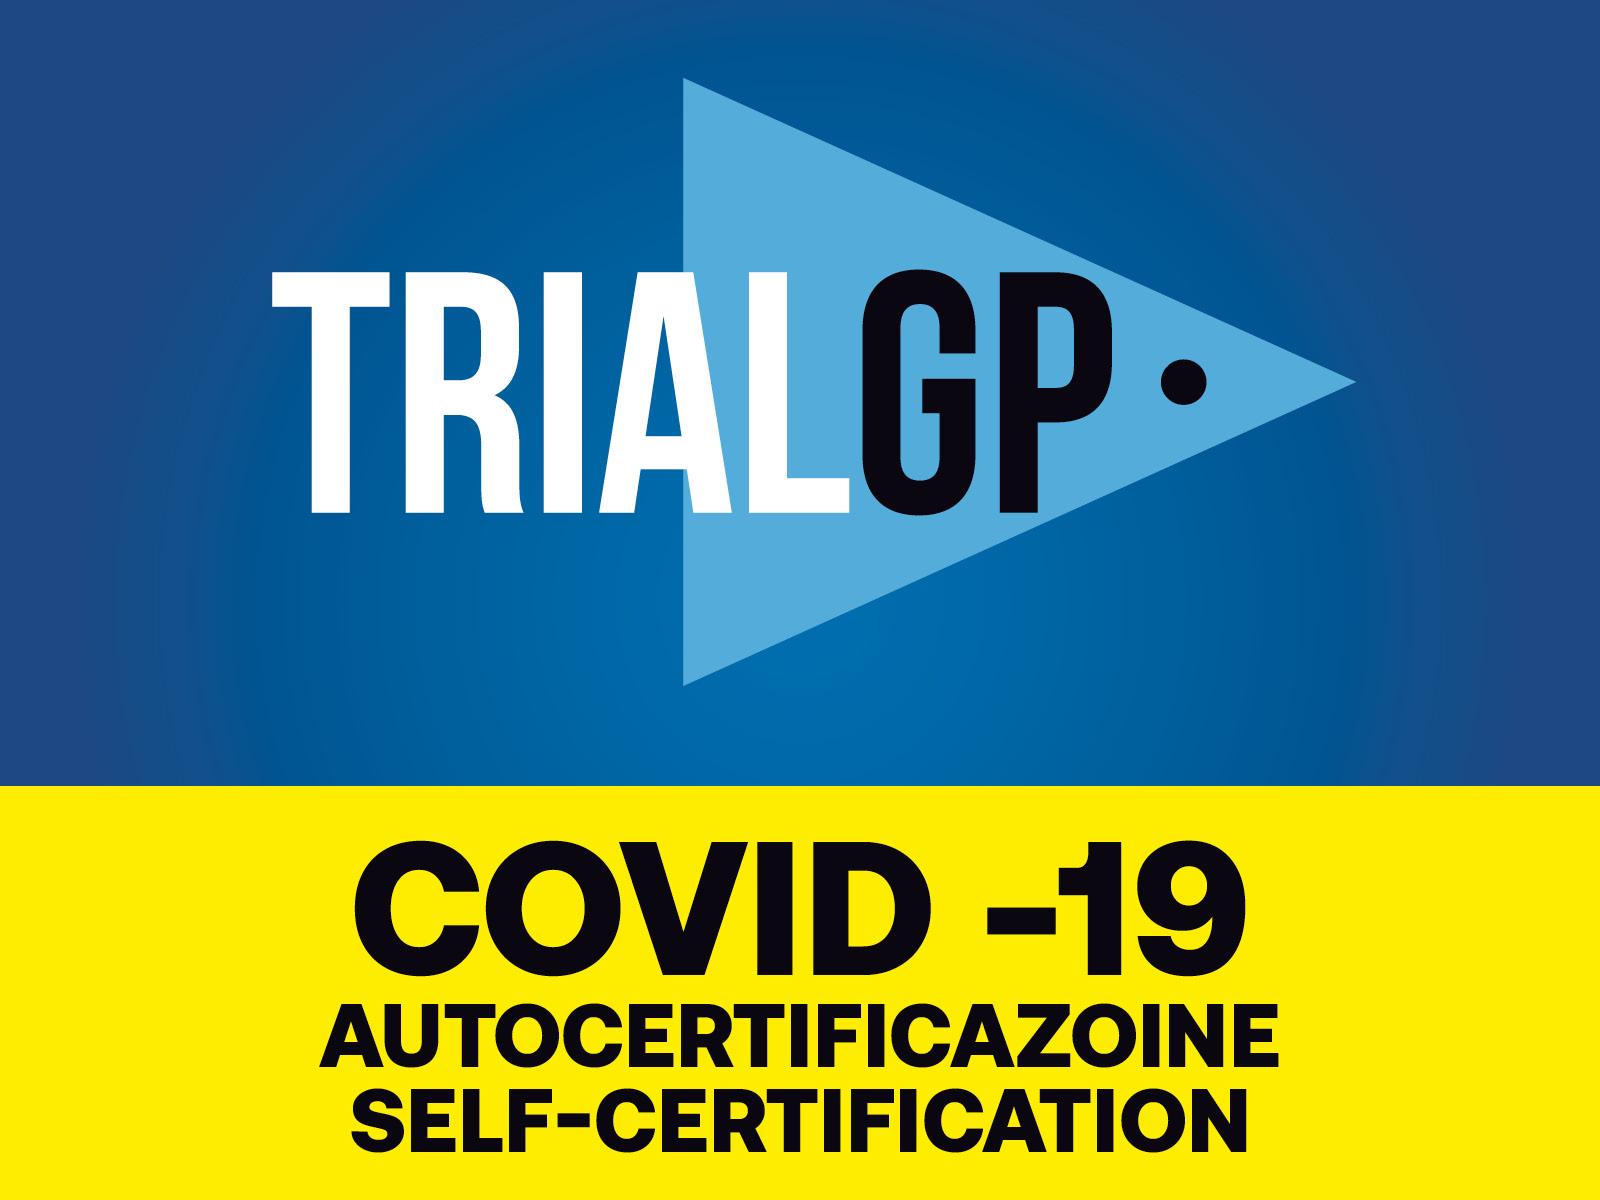 COVID-19 AUTOCERTIFICAZIONE / SELF-CERTIFICATION